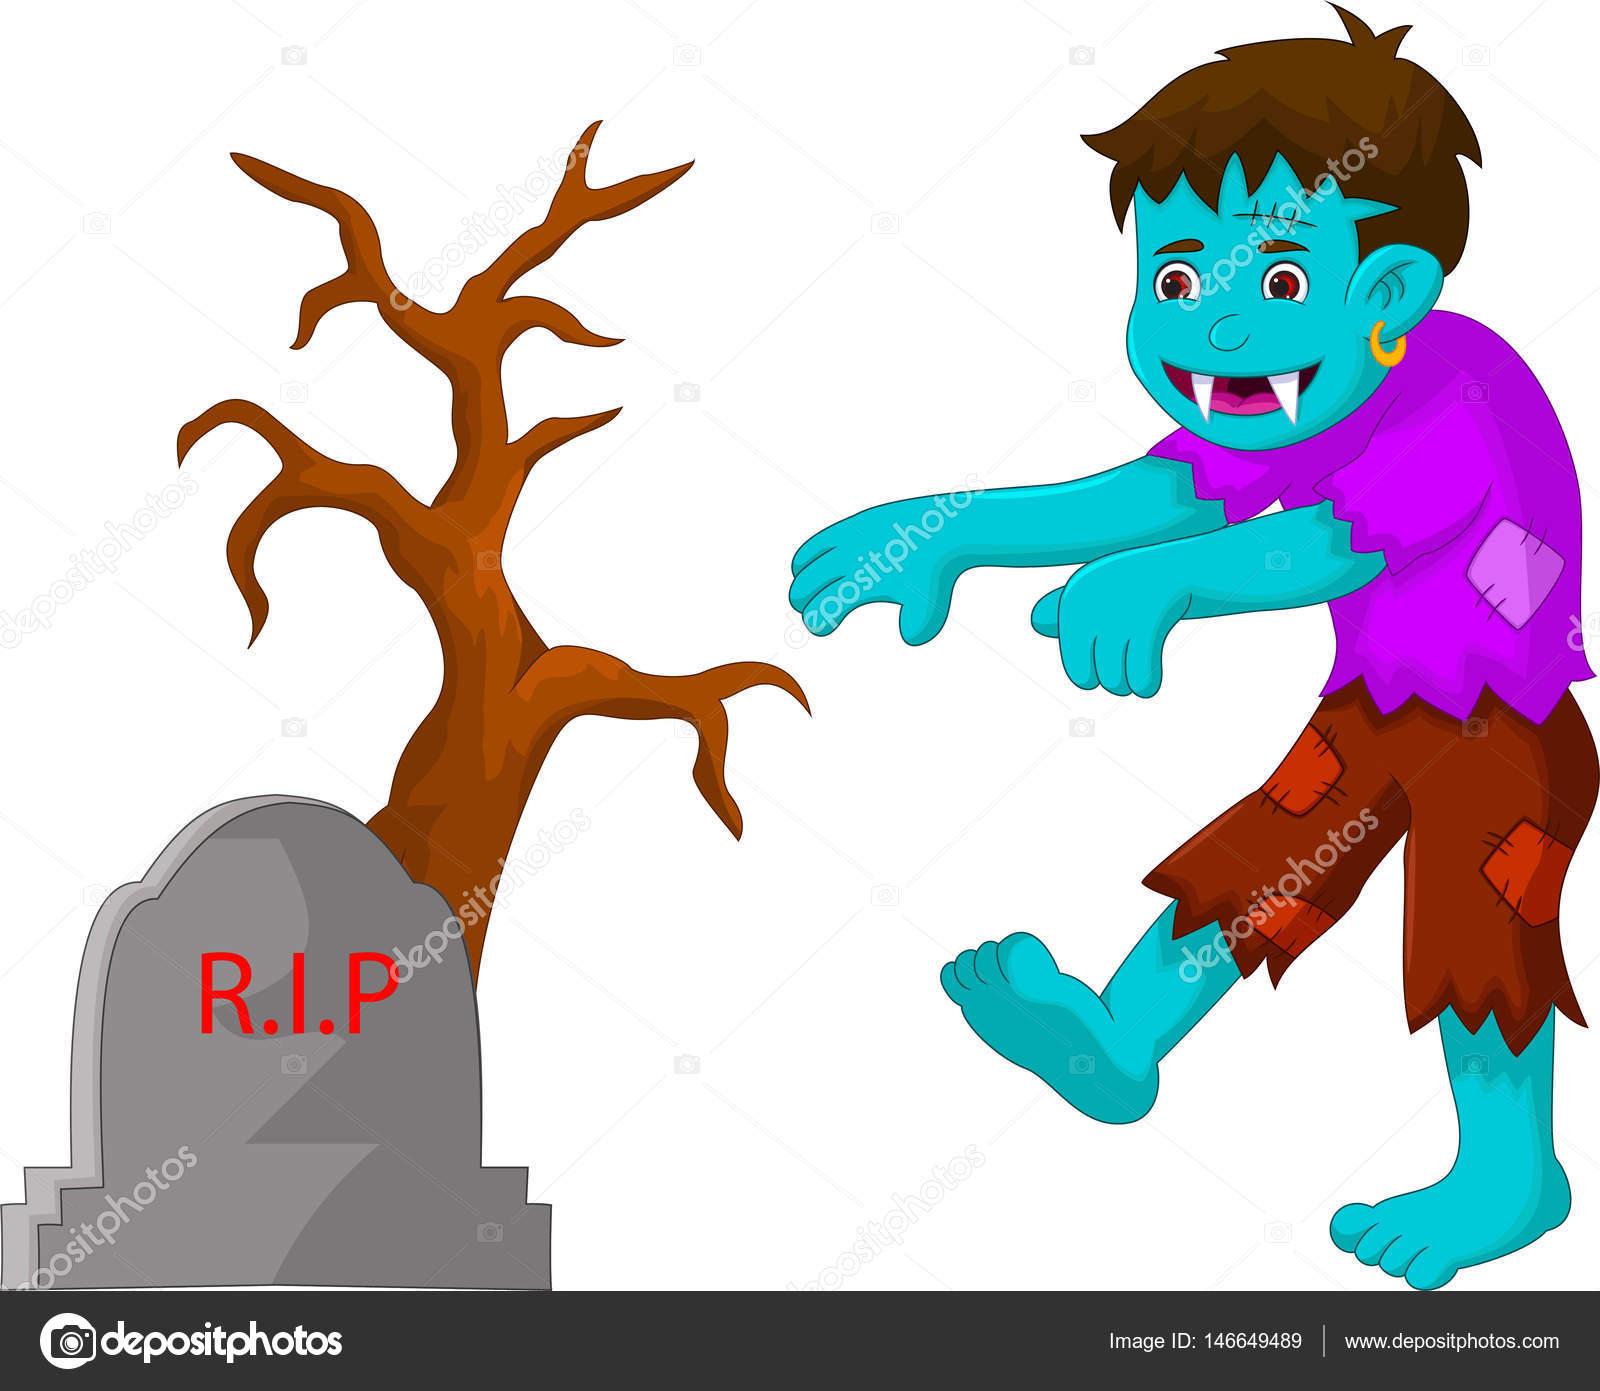 zumbi de desenho animado andando no cemitério vetores de stock